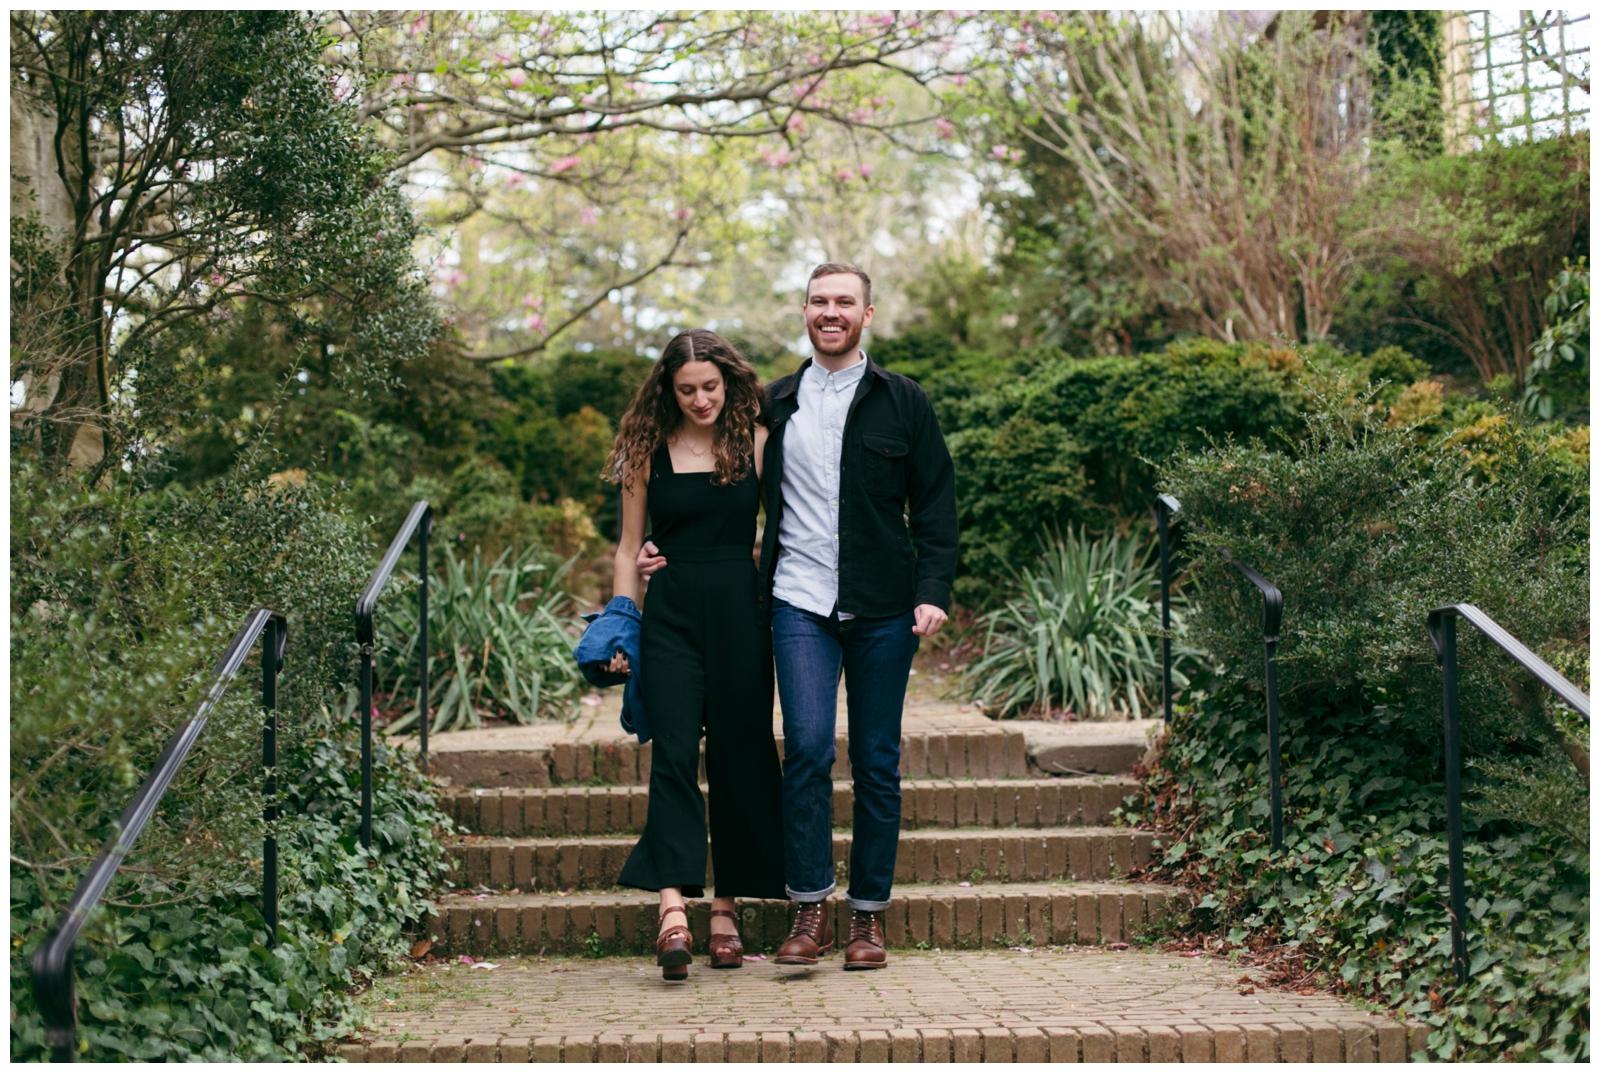 DC-Wedding-Photographer-Bailey-Q-Photo-020.jpg